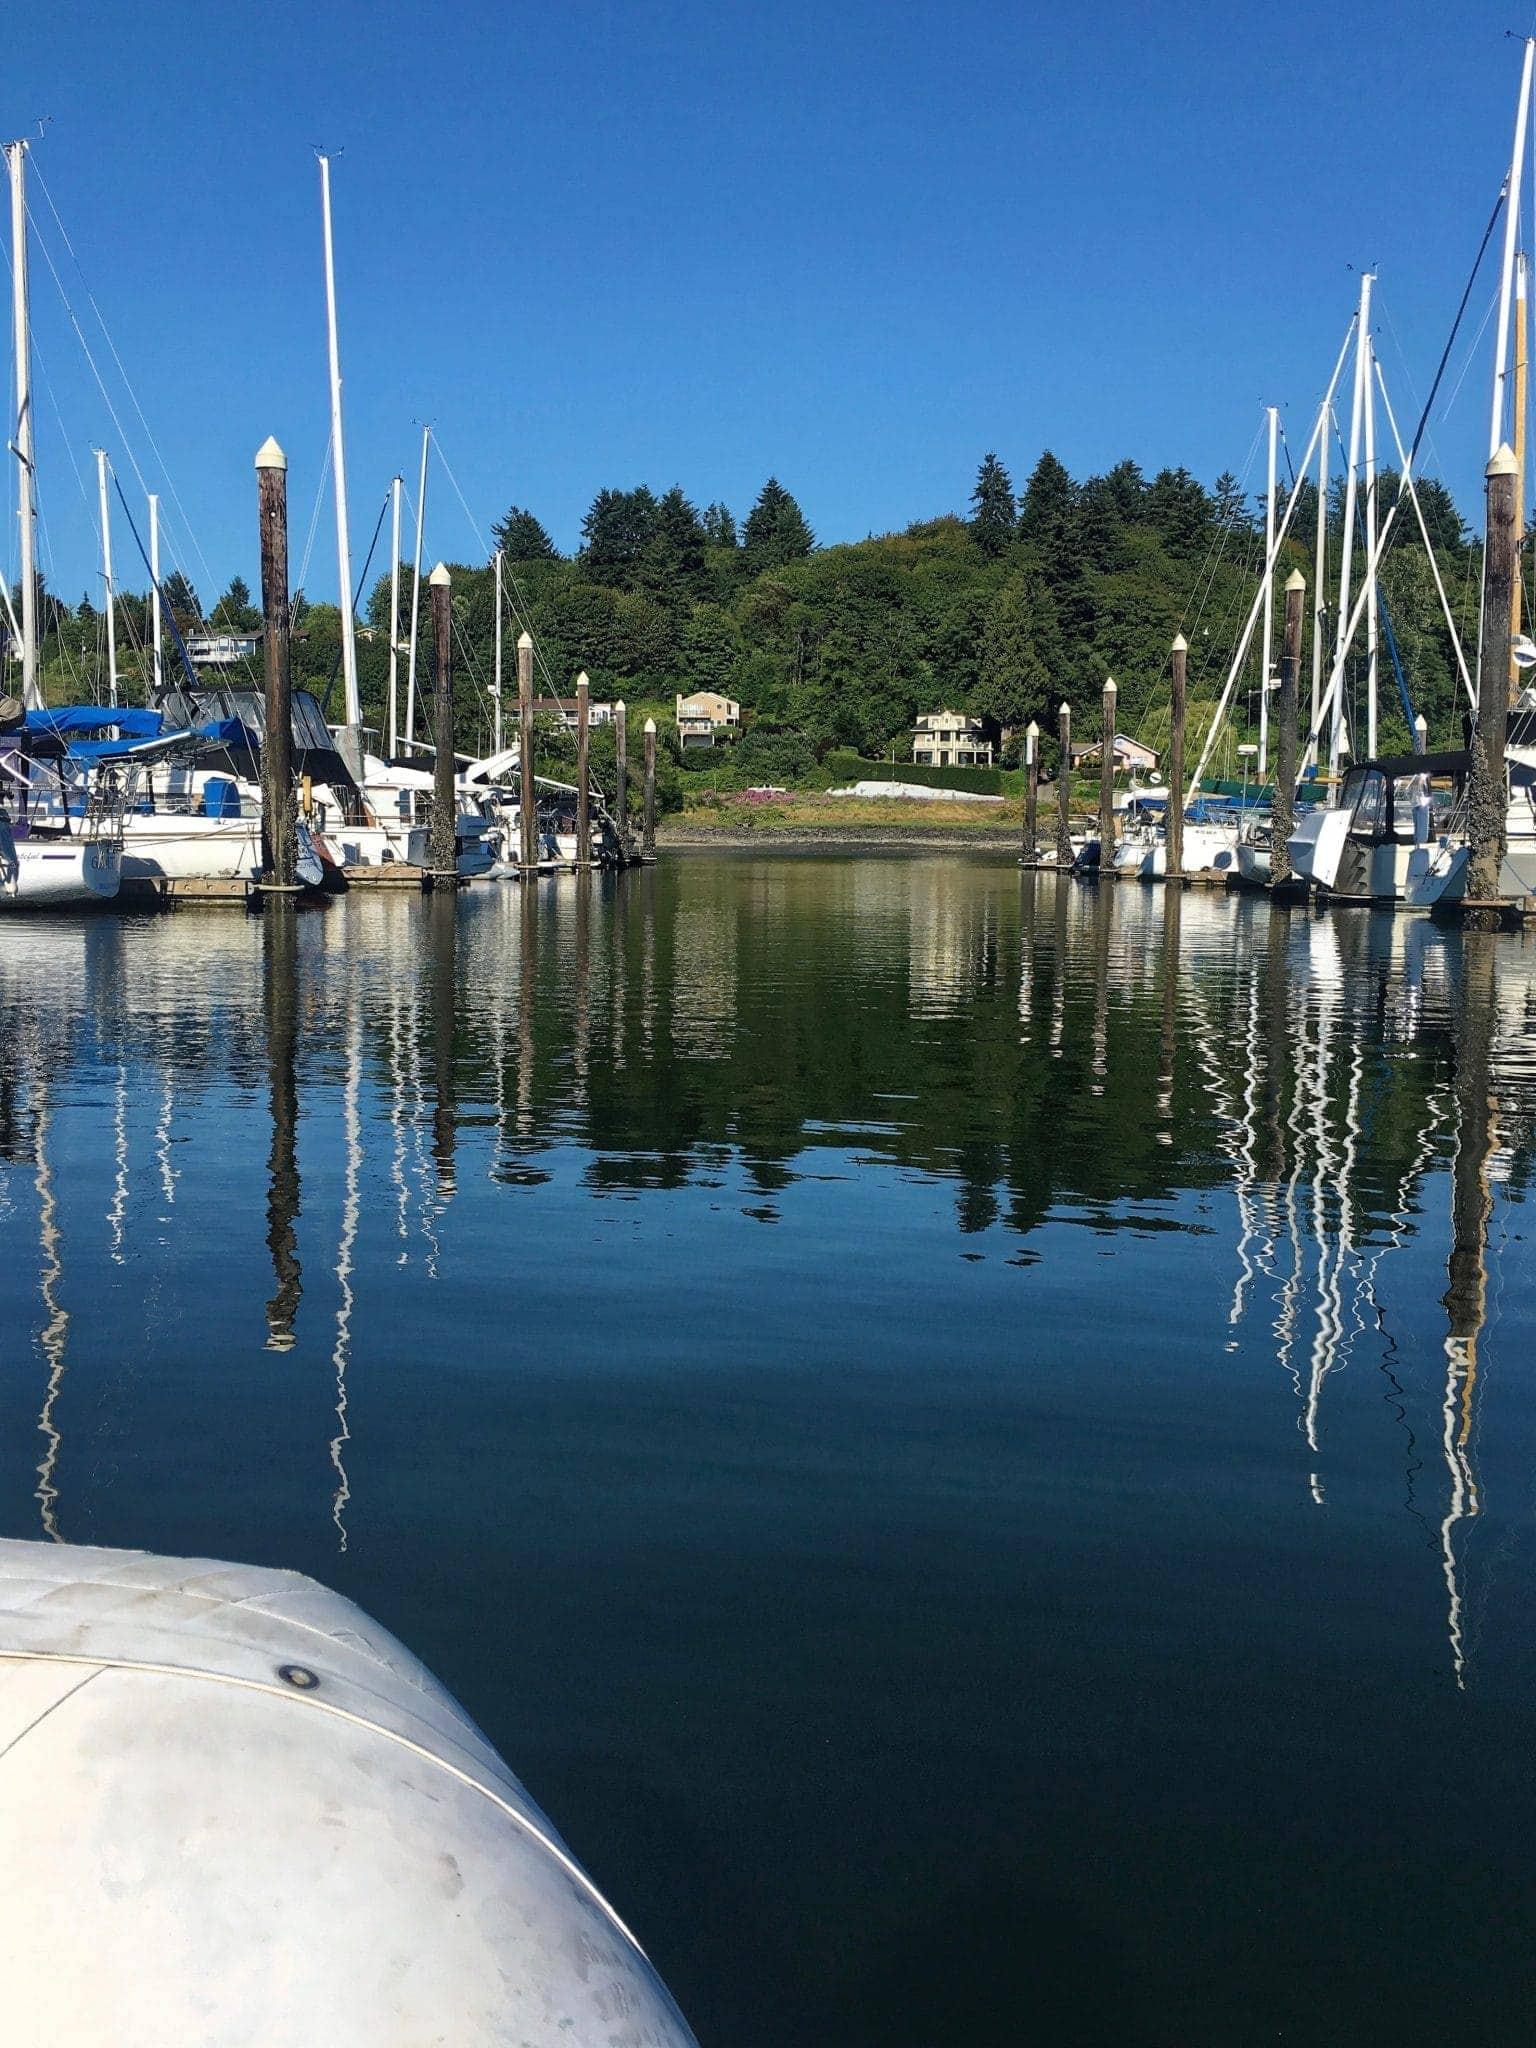 Exploring Swantown docks